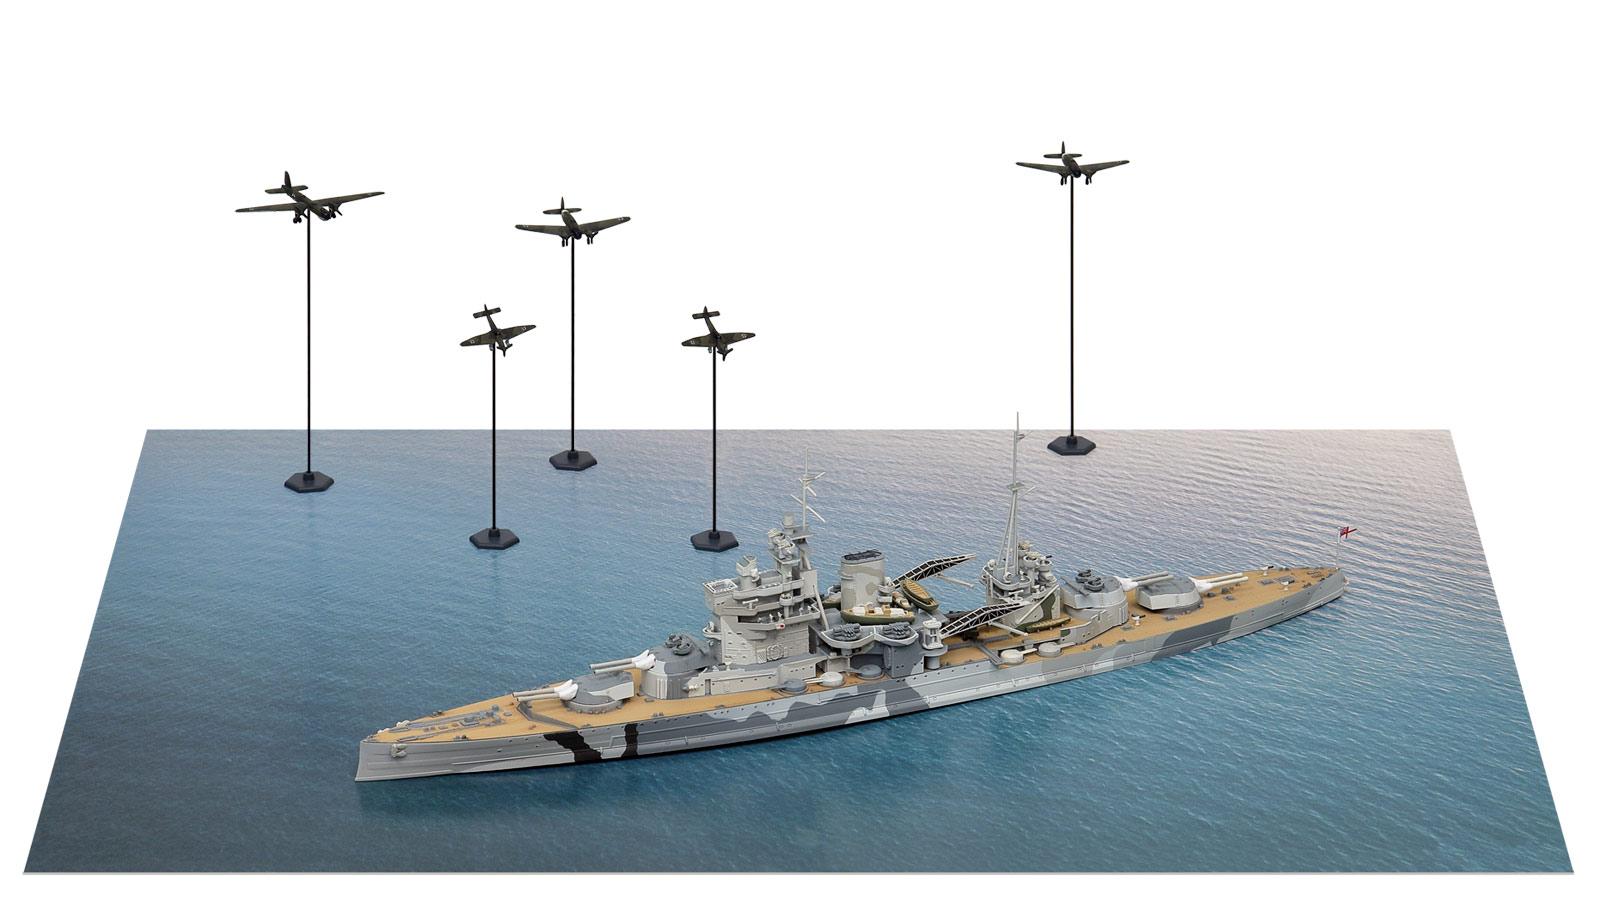 SPS20 1/700 イギリス海軍 戦艦 クイーン・エリザベス VS ドイツ空軍